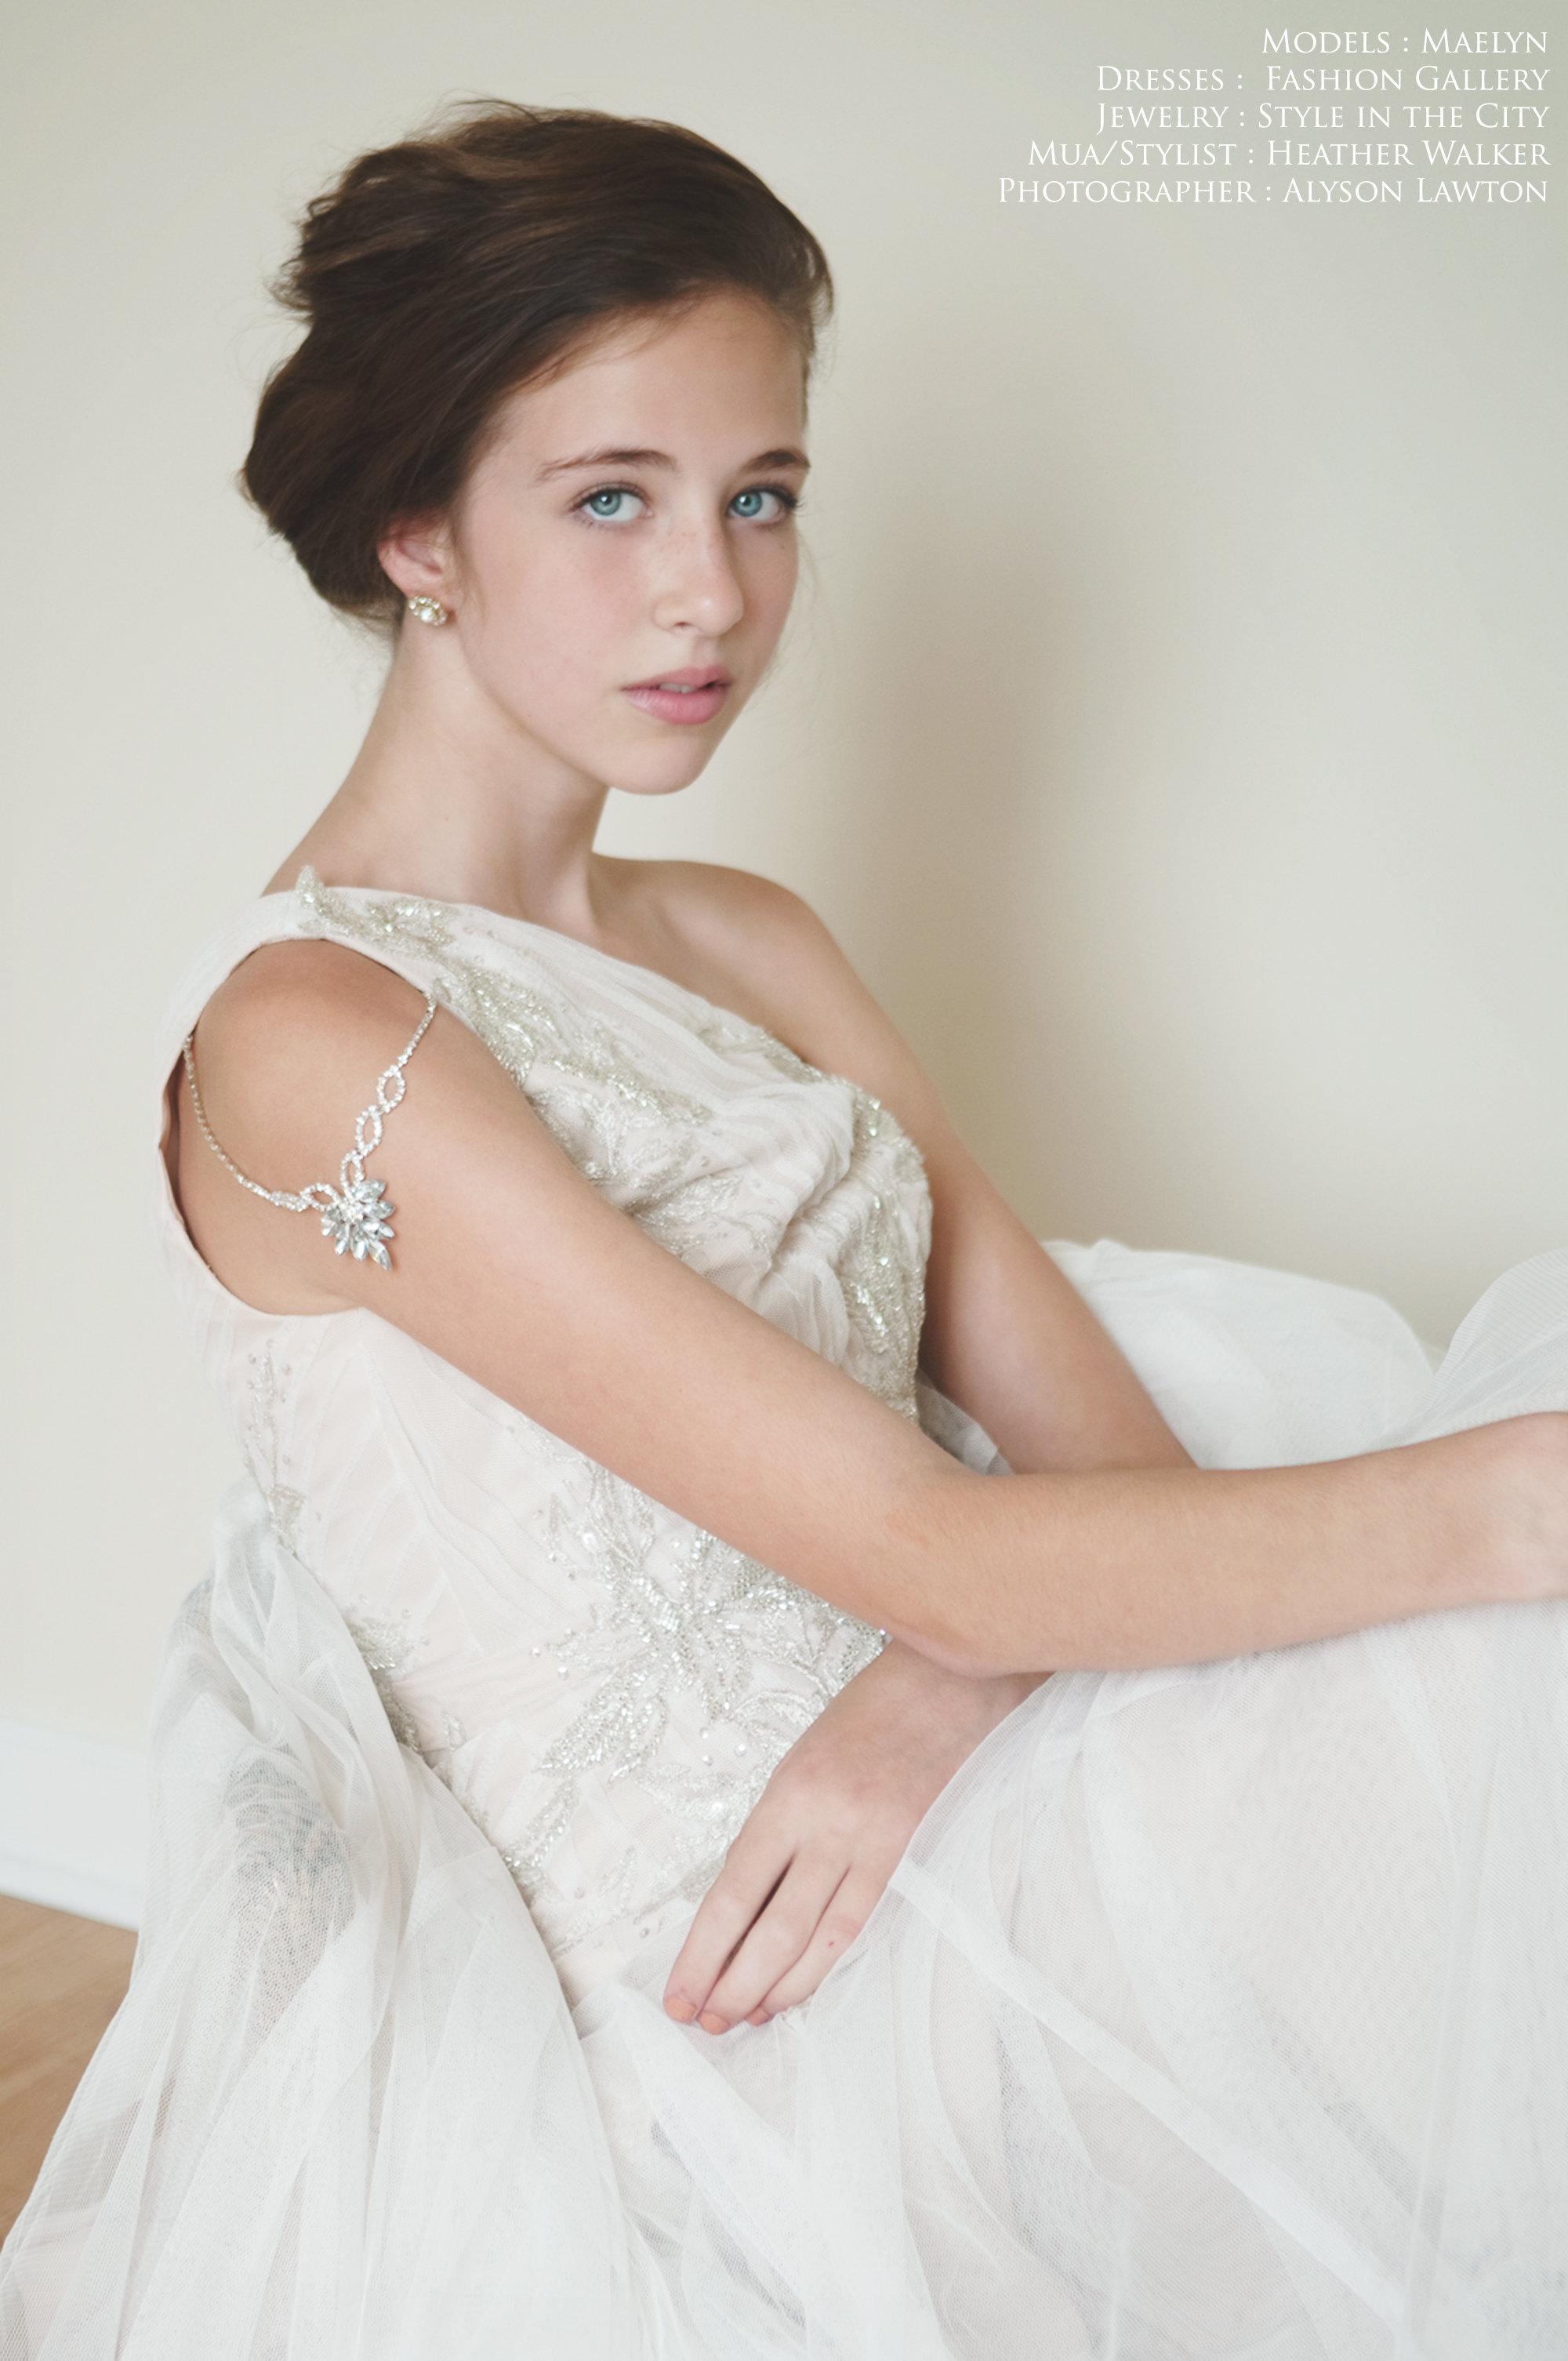 Clothing & Accessories: Alyson Lawton | Hair | MUA: Heather Walker | Photographer: Alyson Lawton